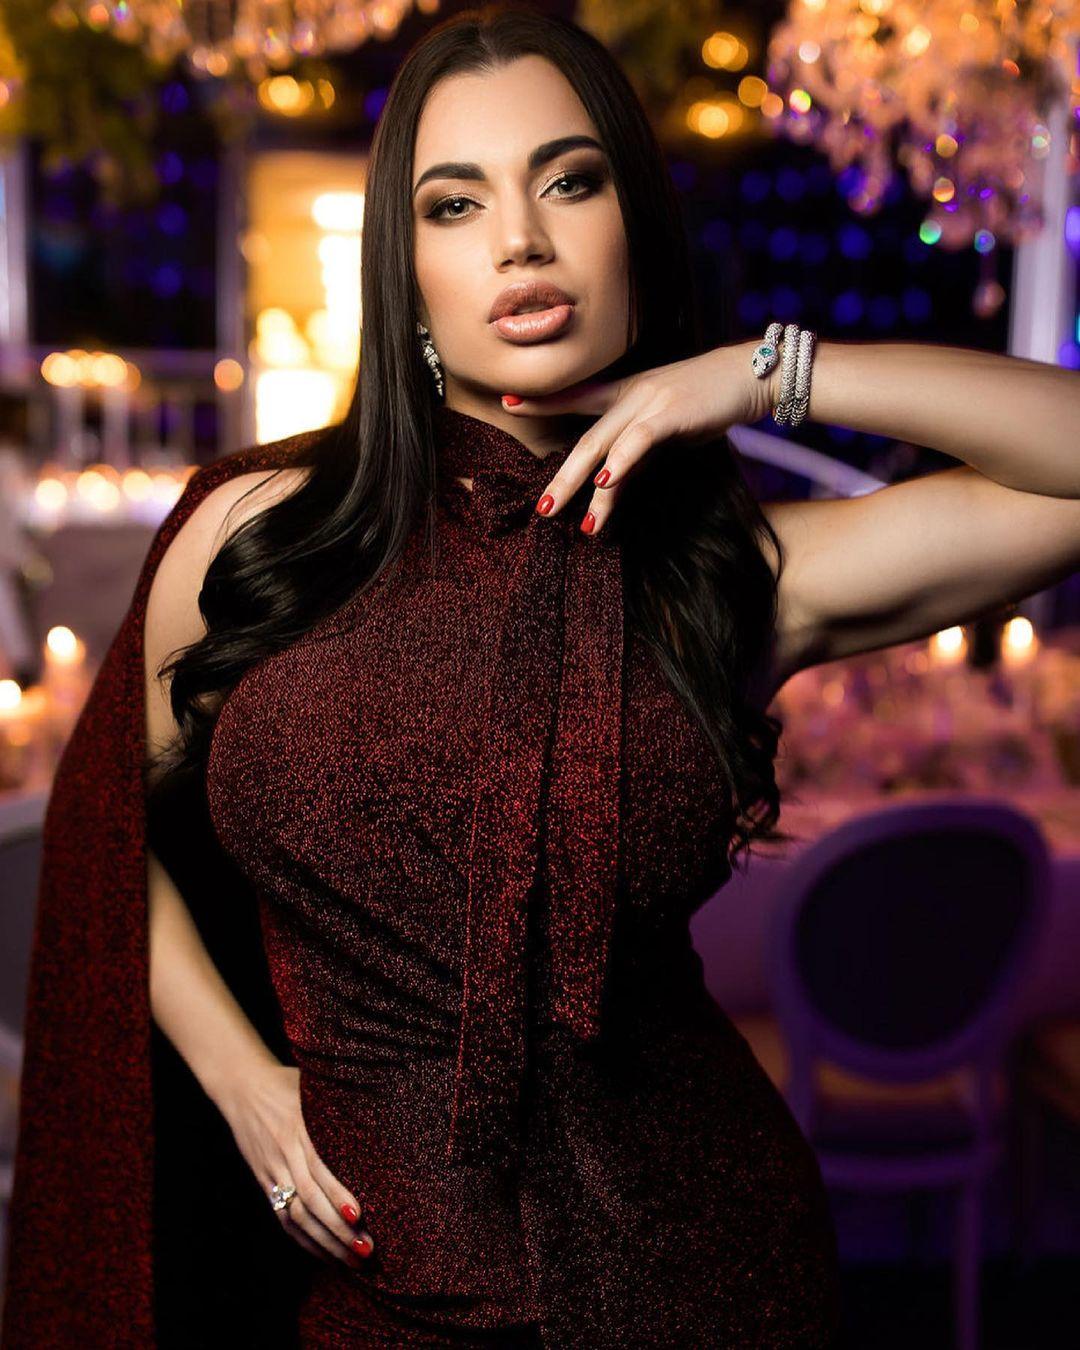 Anastasia-Vladimirovna-Wallpapers-Insta-Fit-Bio-1